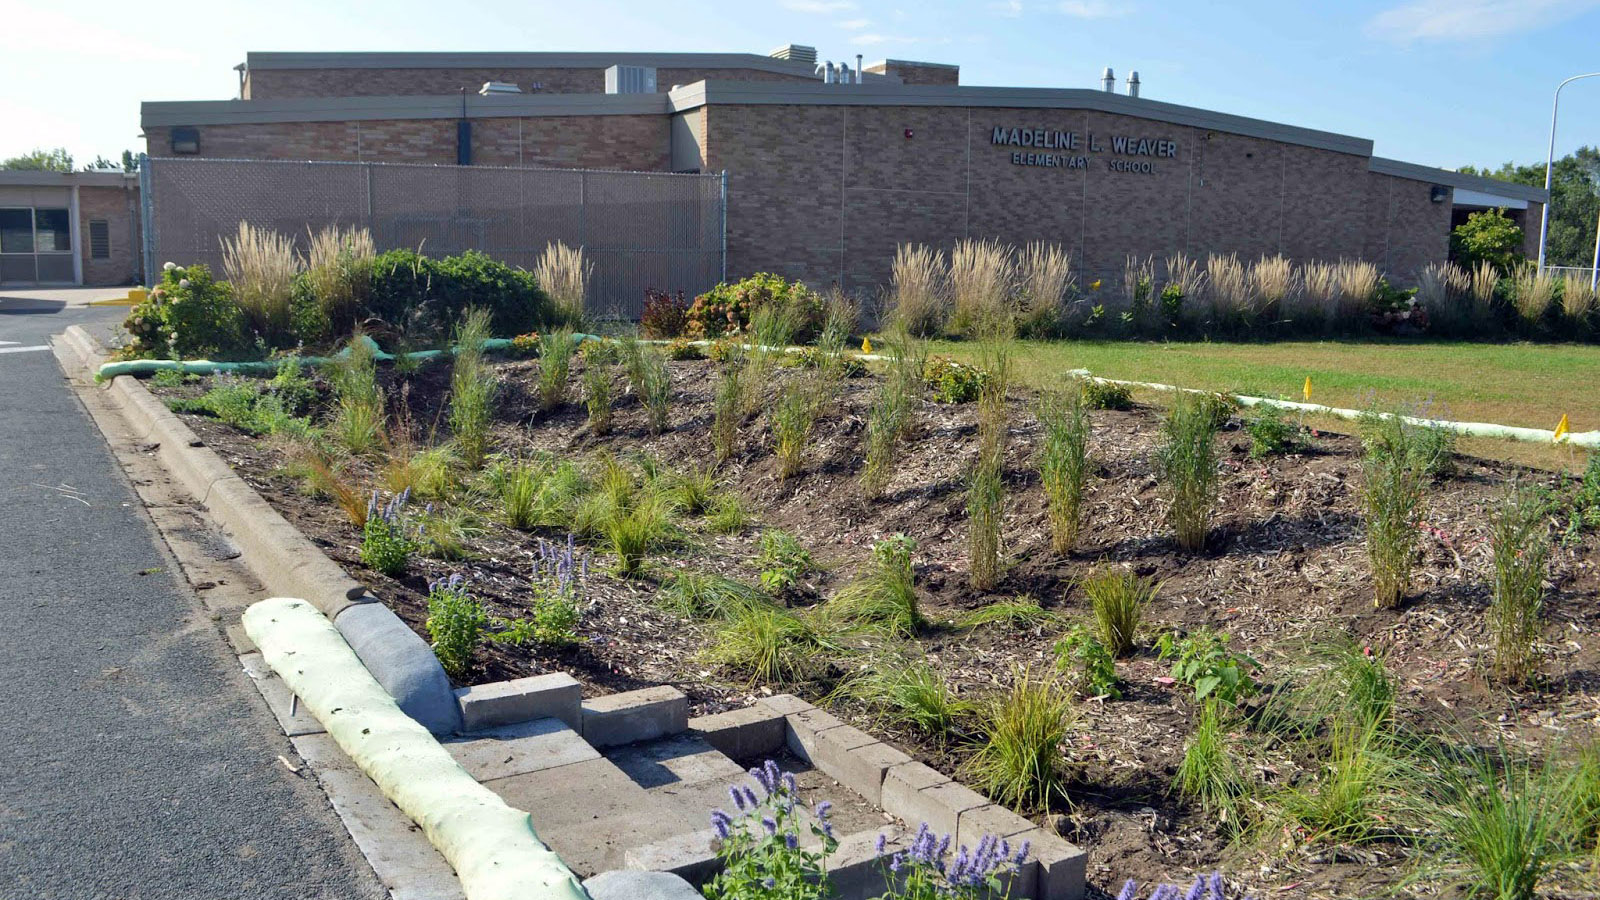 Weaver Elementary School rain garden